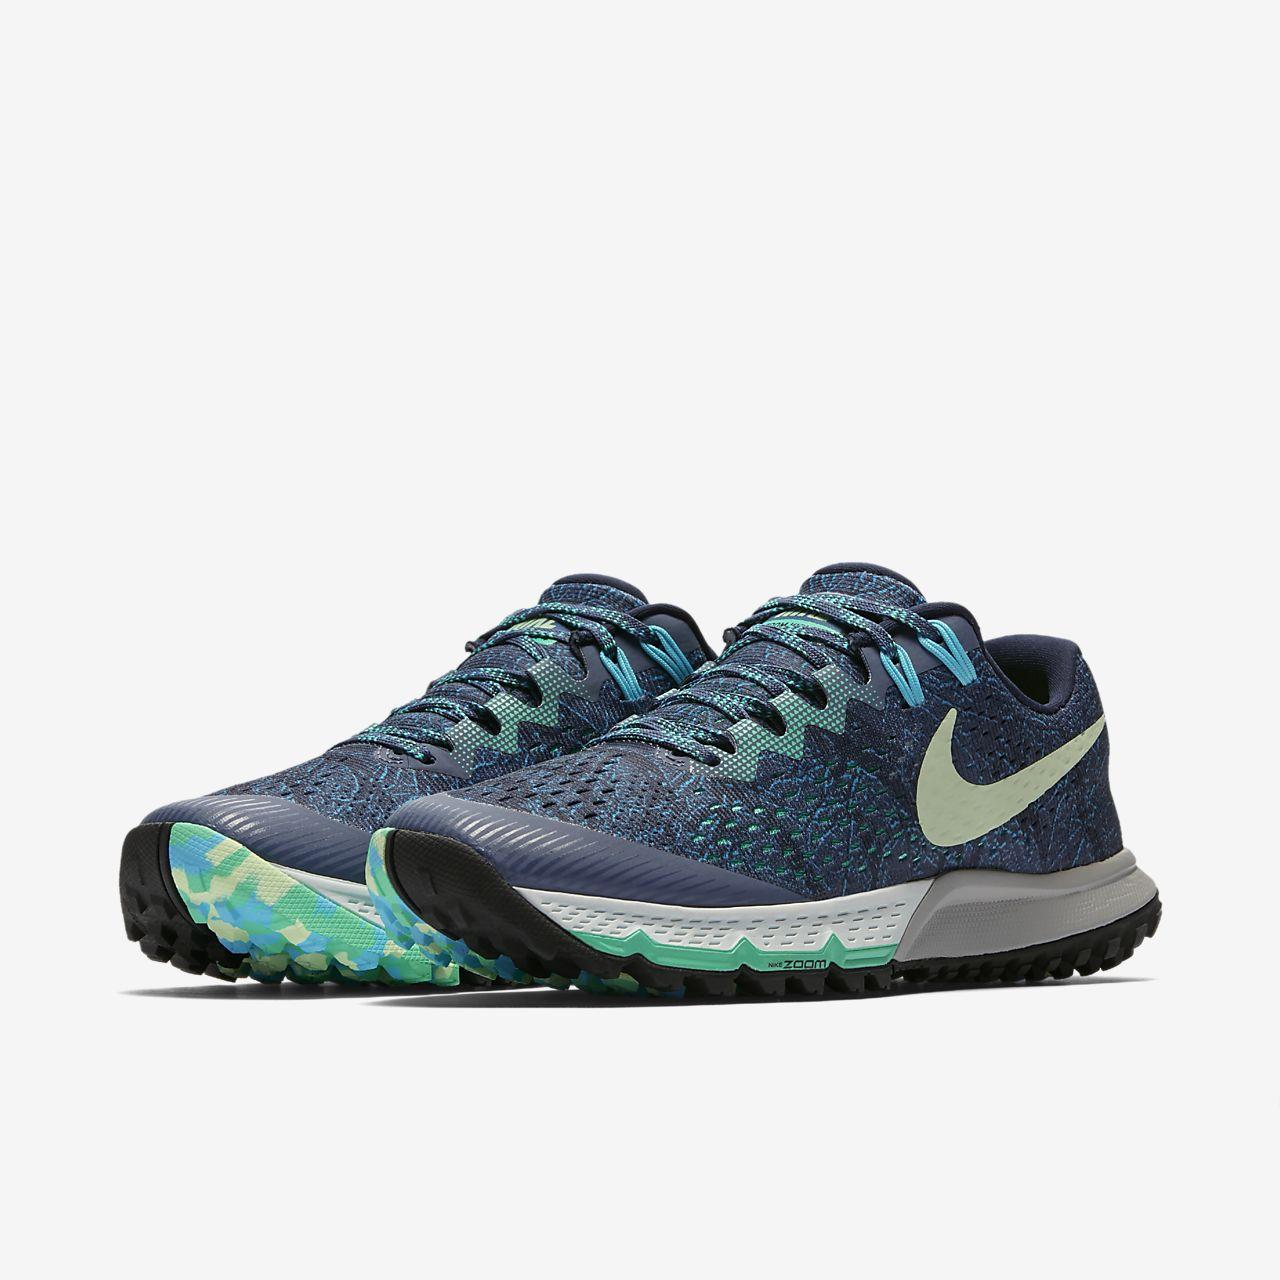 ... Nike Air Zoom Terra Kiger 4 Women's Running Shoe